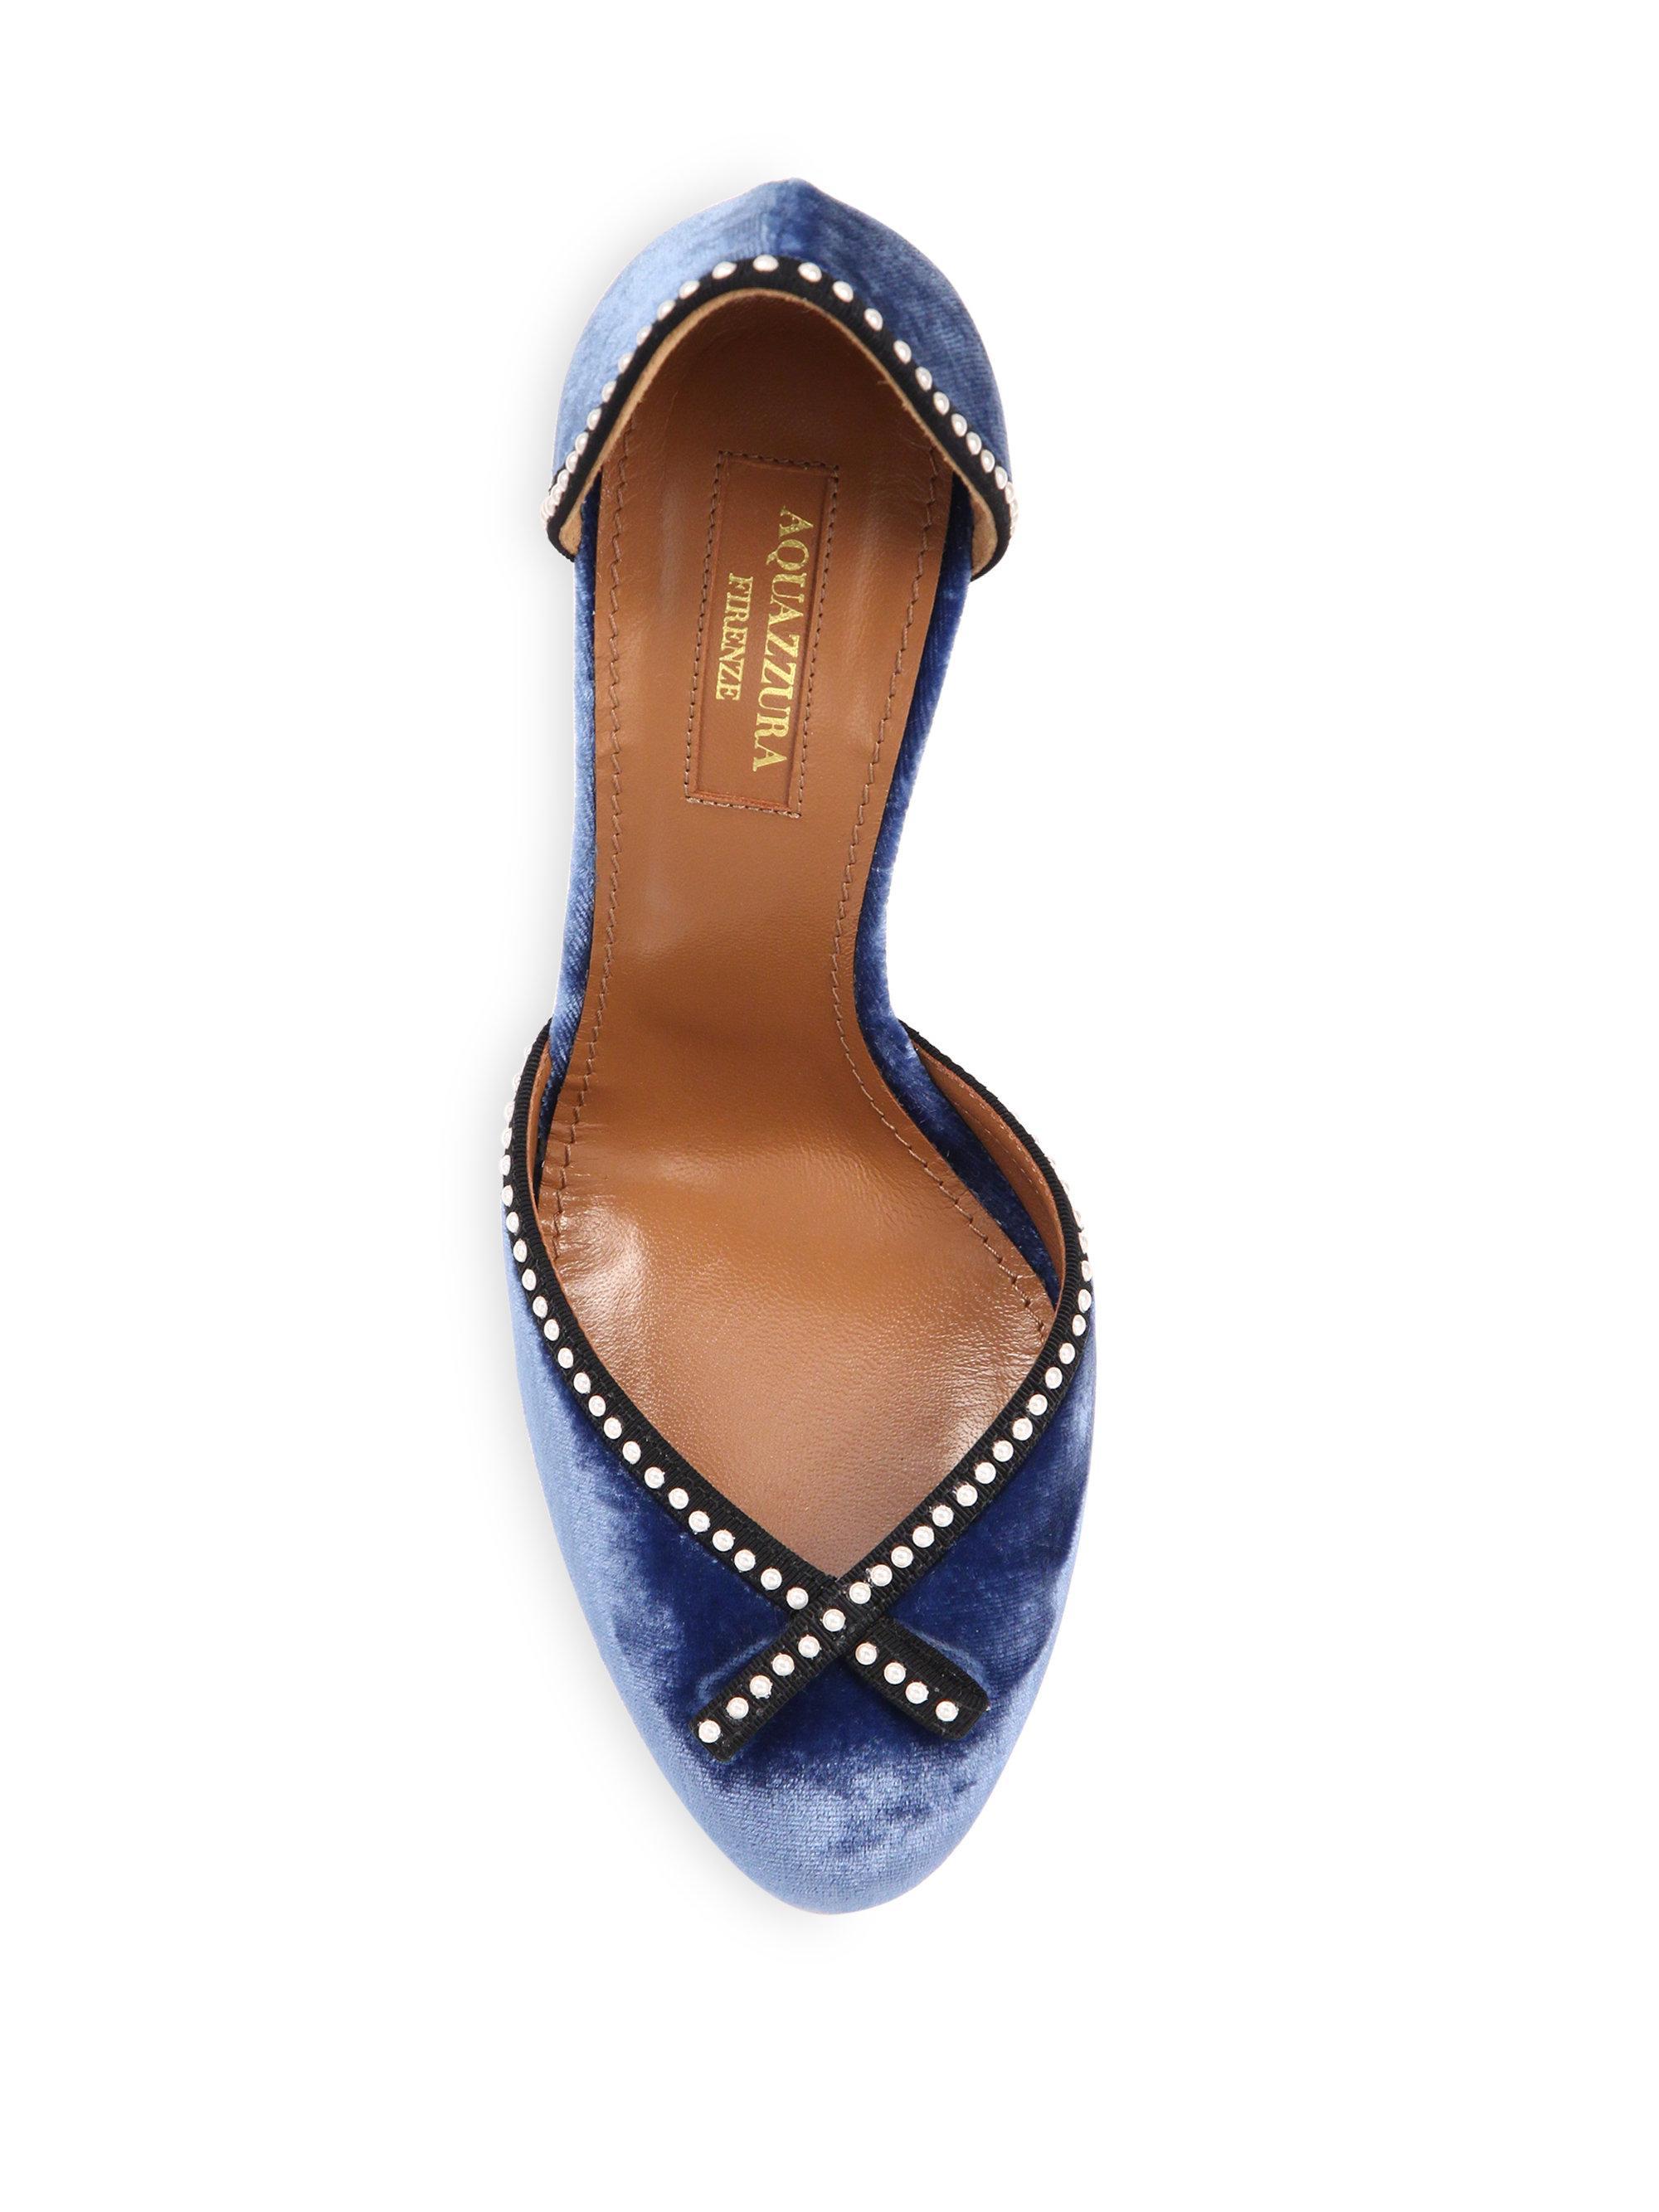 0fe3dc9feab Lyst - Aquazzura Lou Lou Pearly Velvet Block Heel Pumps in Blue